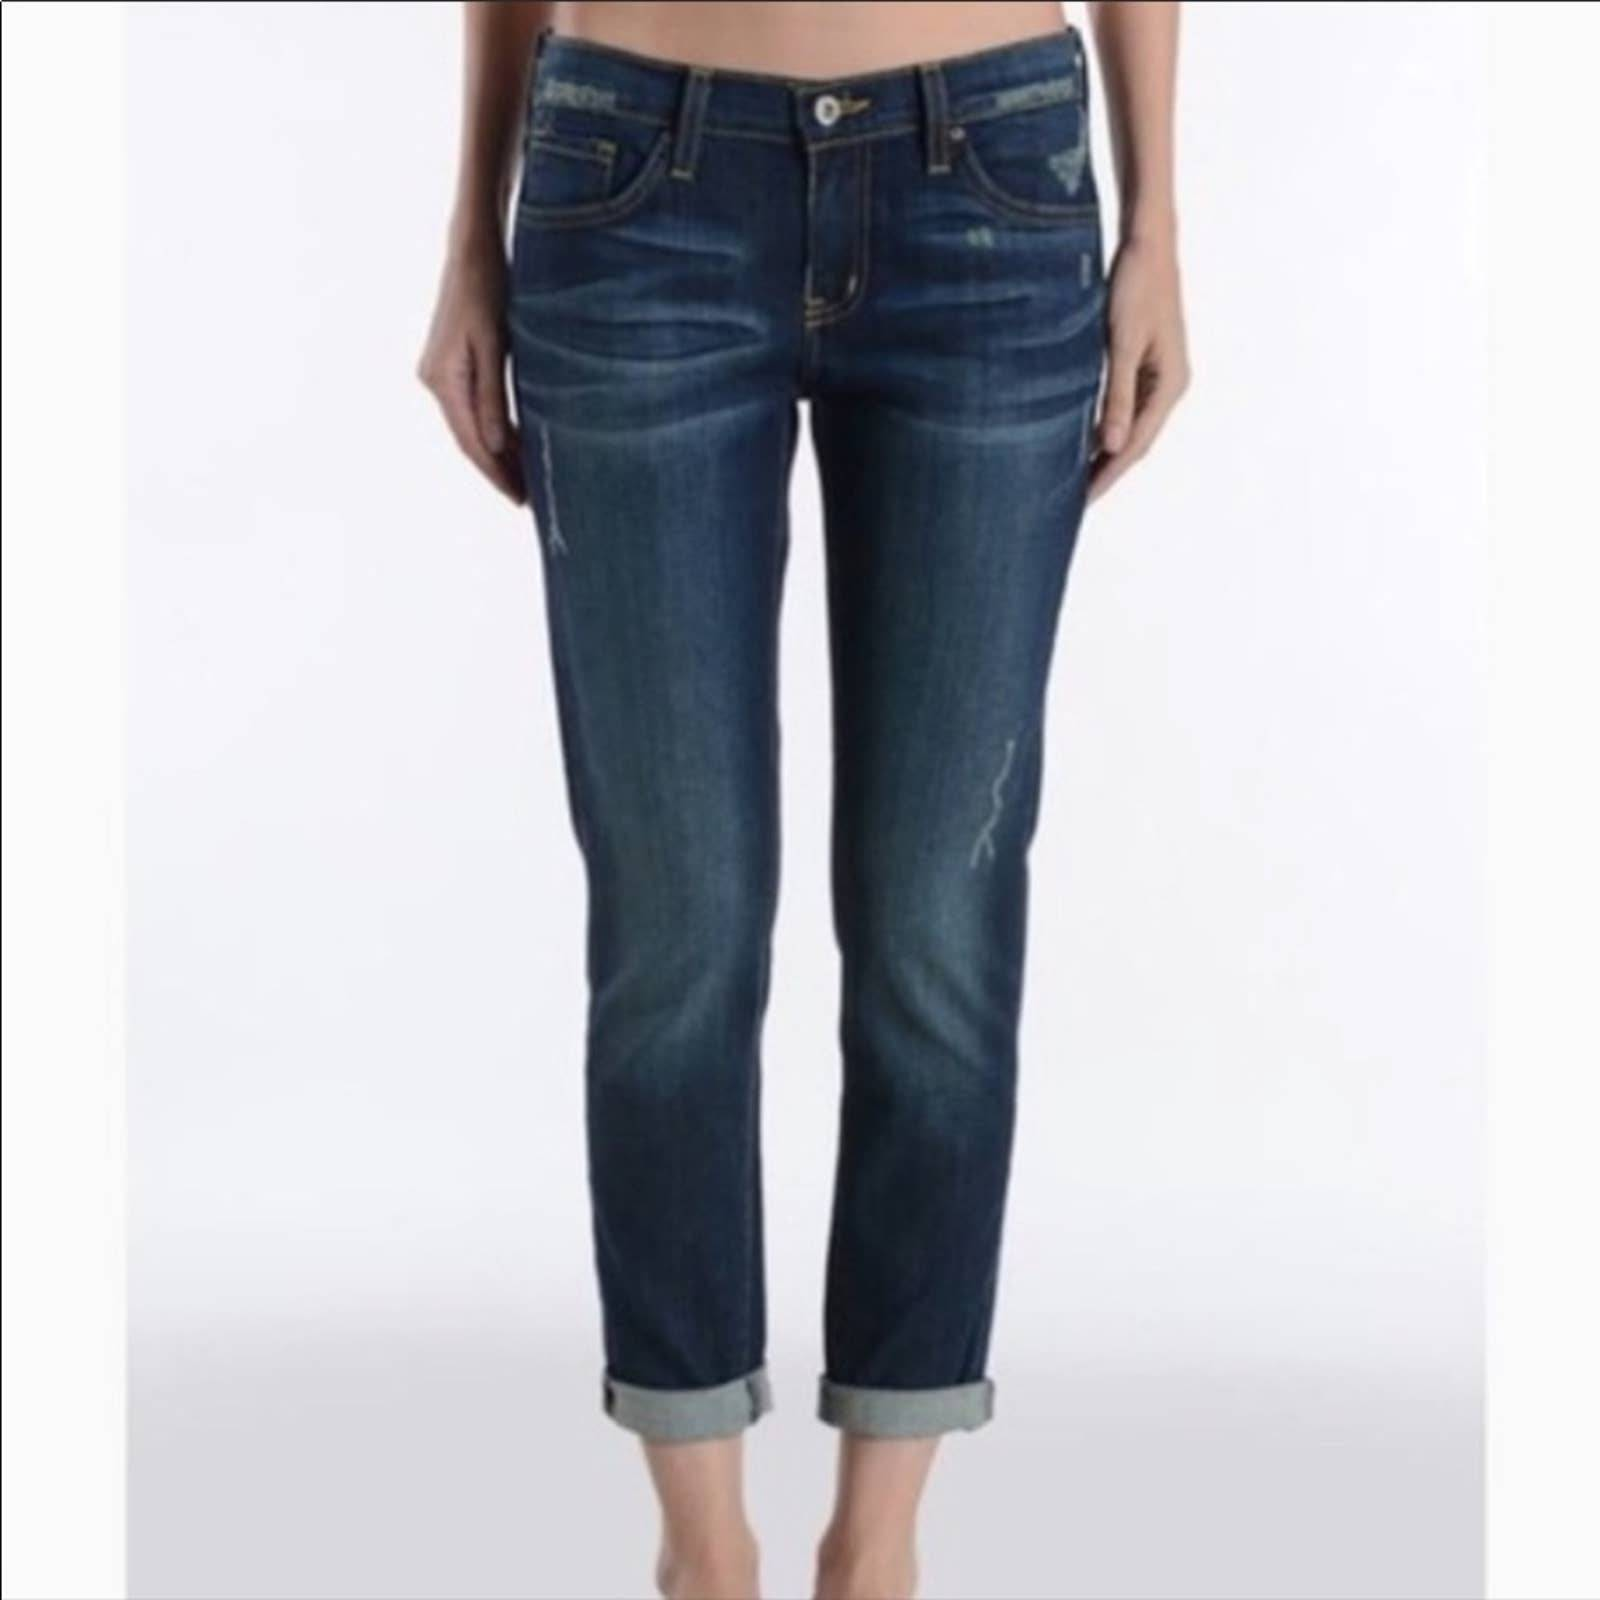 Just Black Boyfriend Jeans Size 32